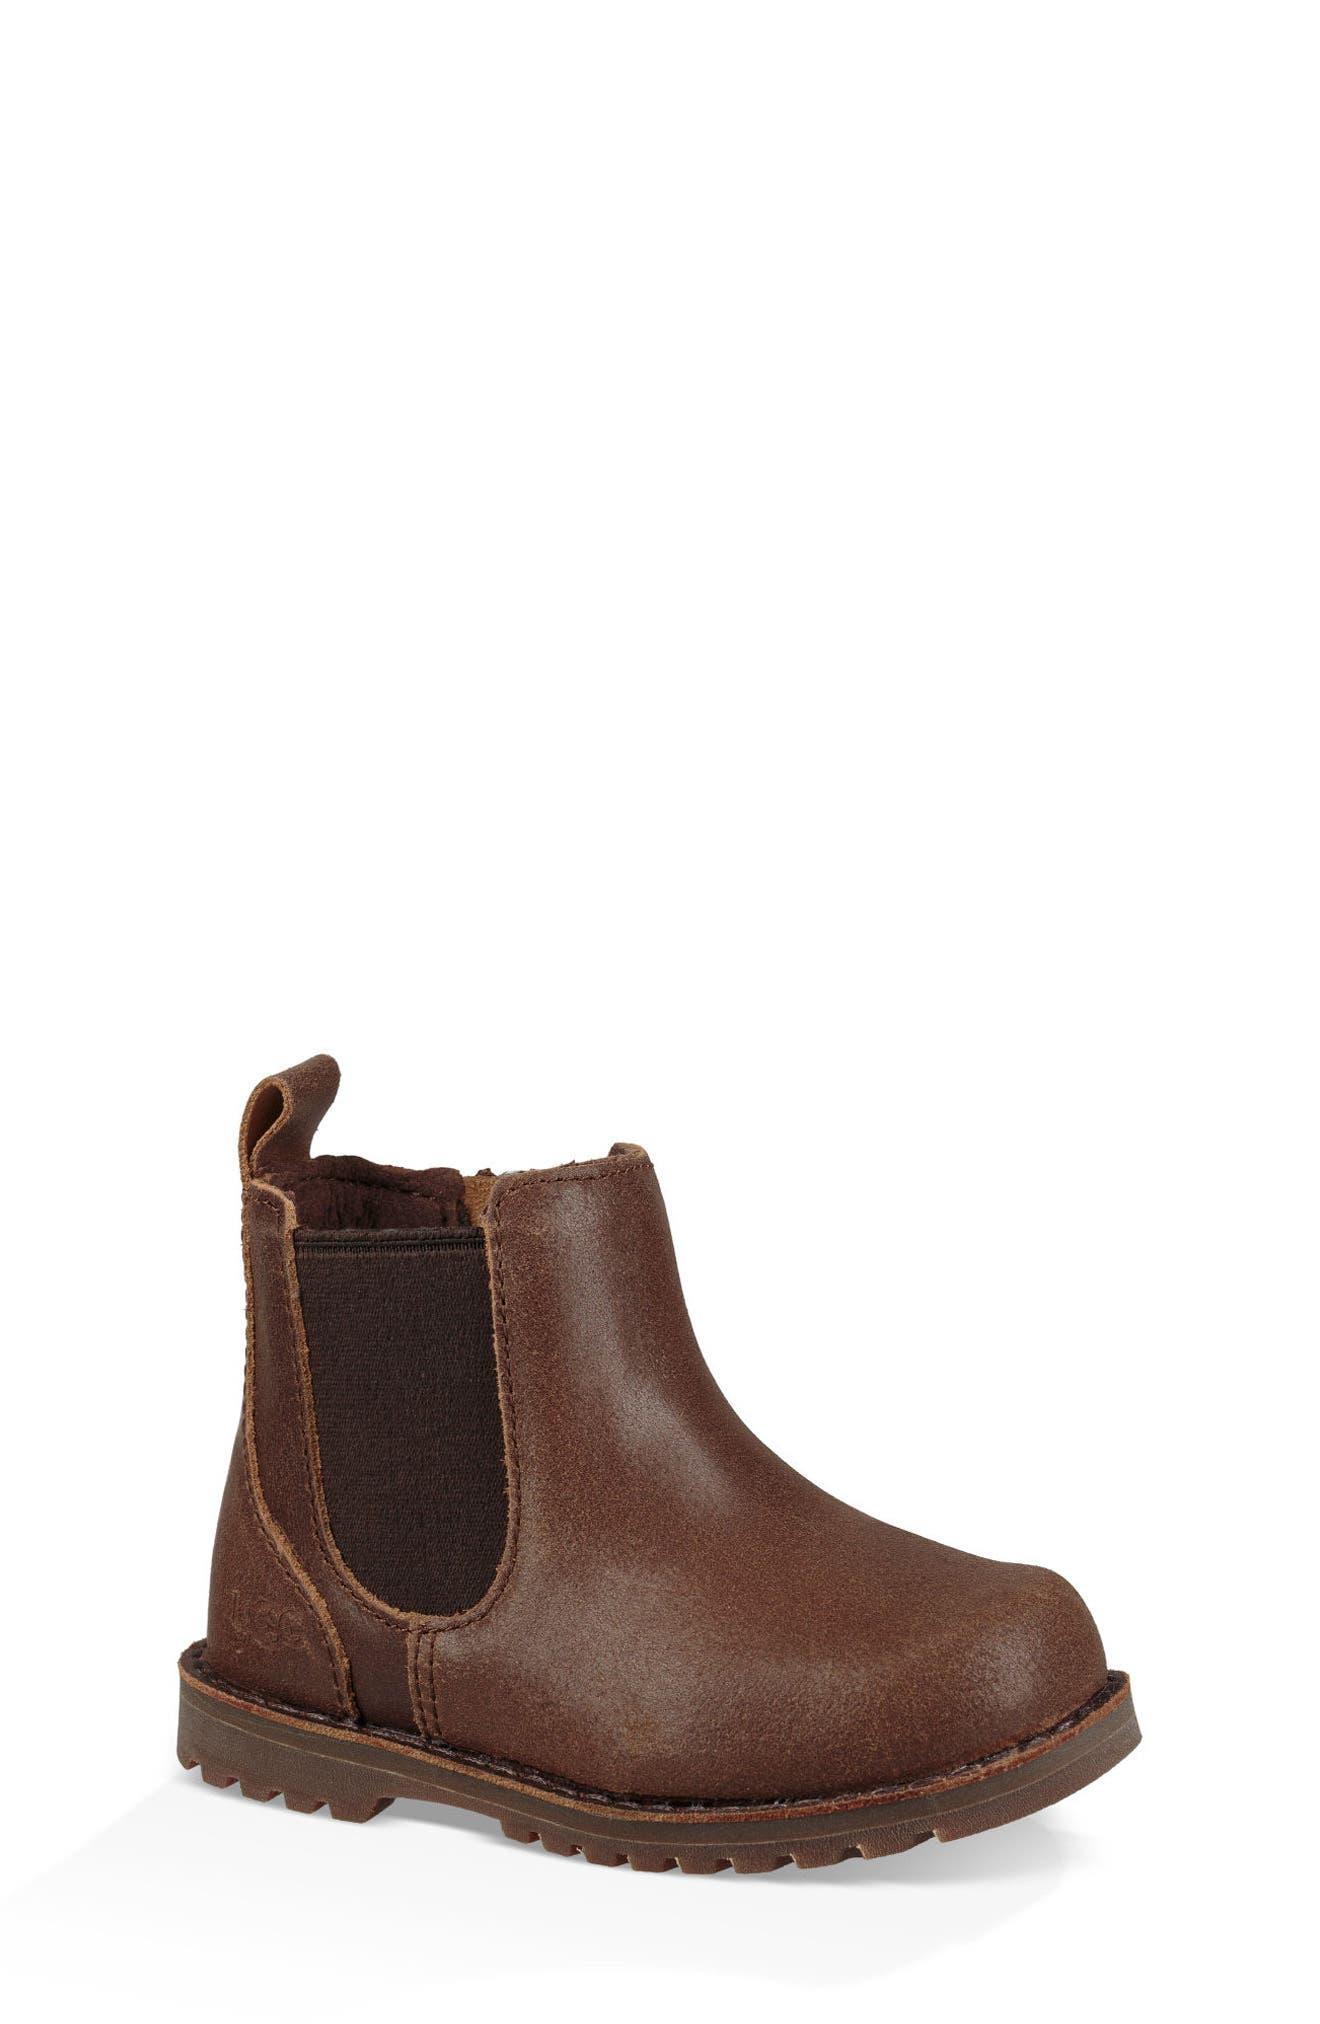 Callum Water Resistant Chelsea Boot,                         Main,                         color, Chocolate Brown